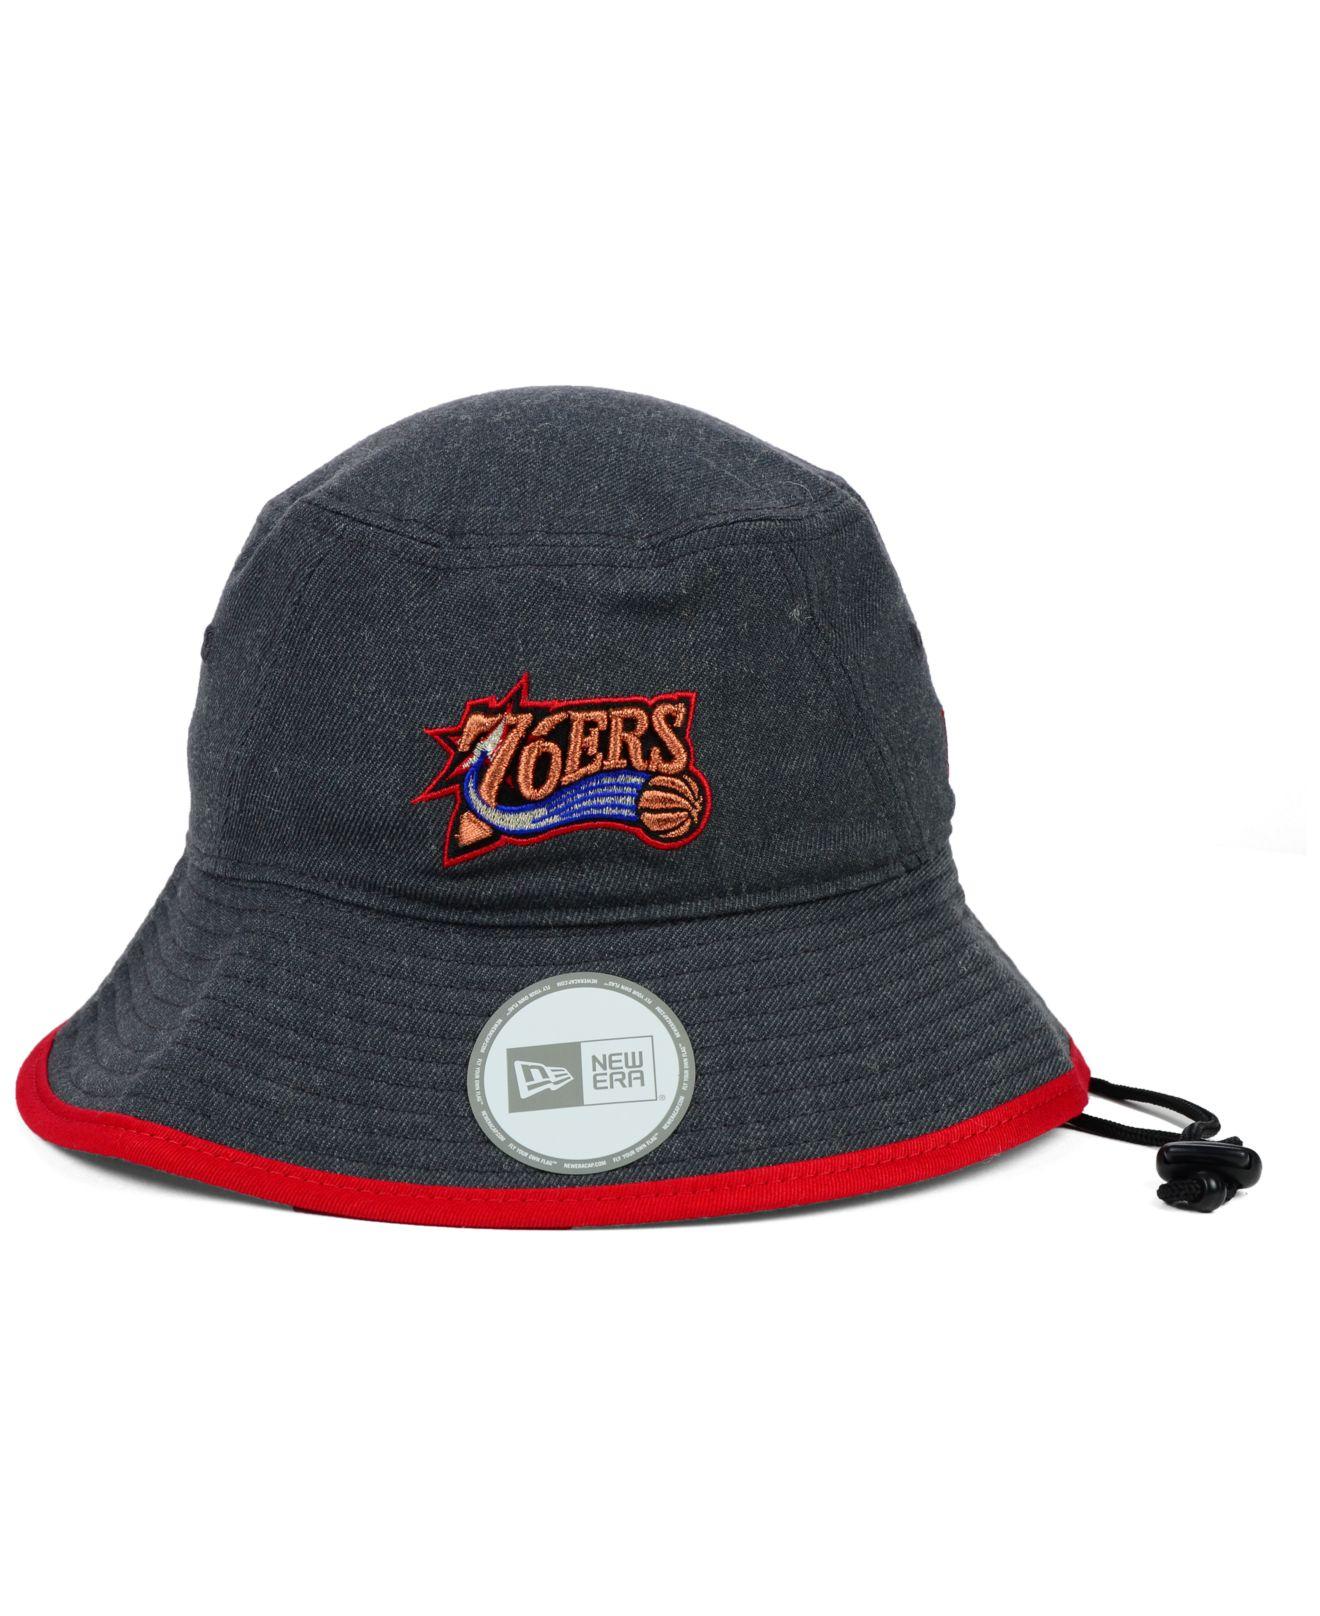 69563074470 Lyst - KTZ Philadelphia 76ers Dark Heather Tipped Bucket Hat in ...